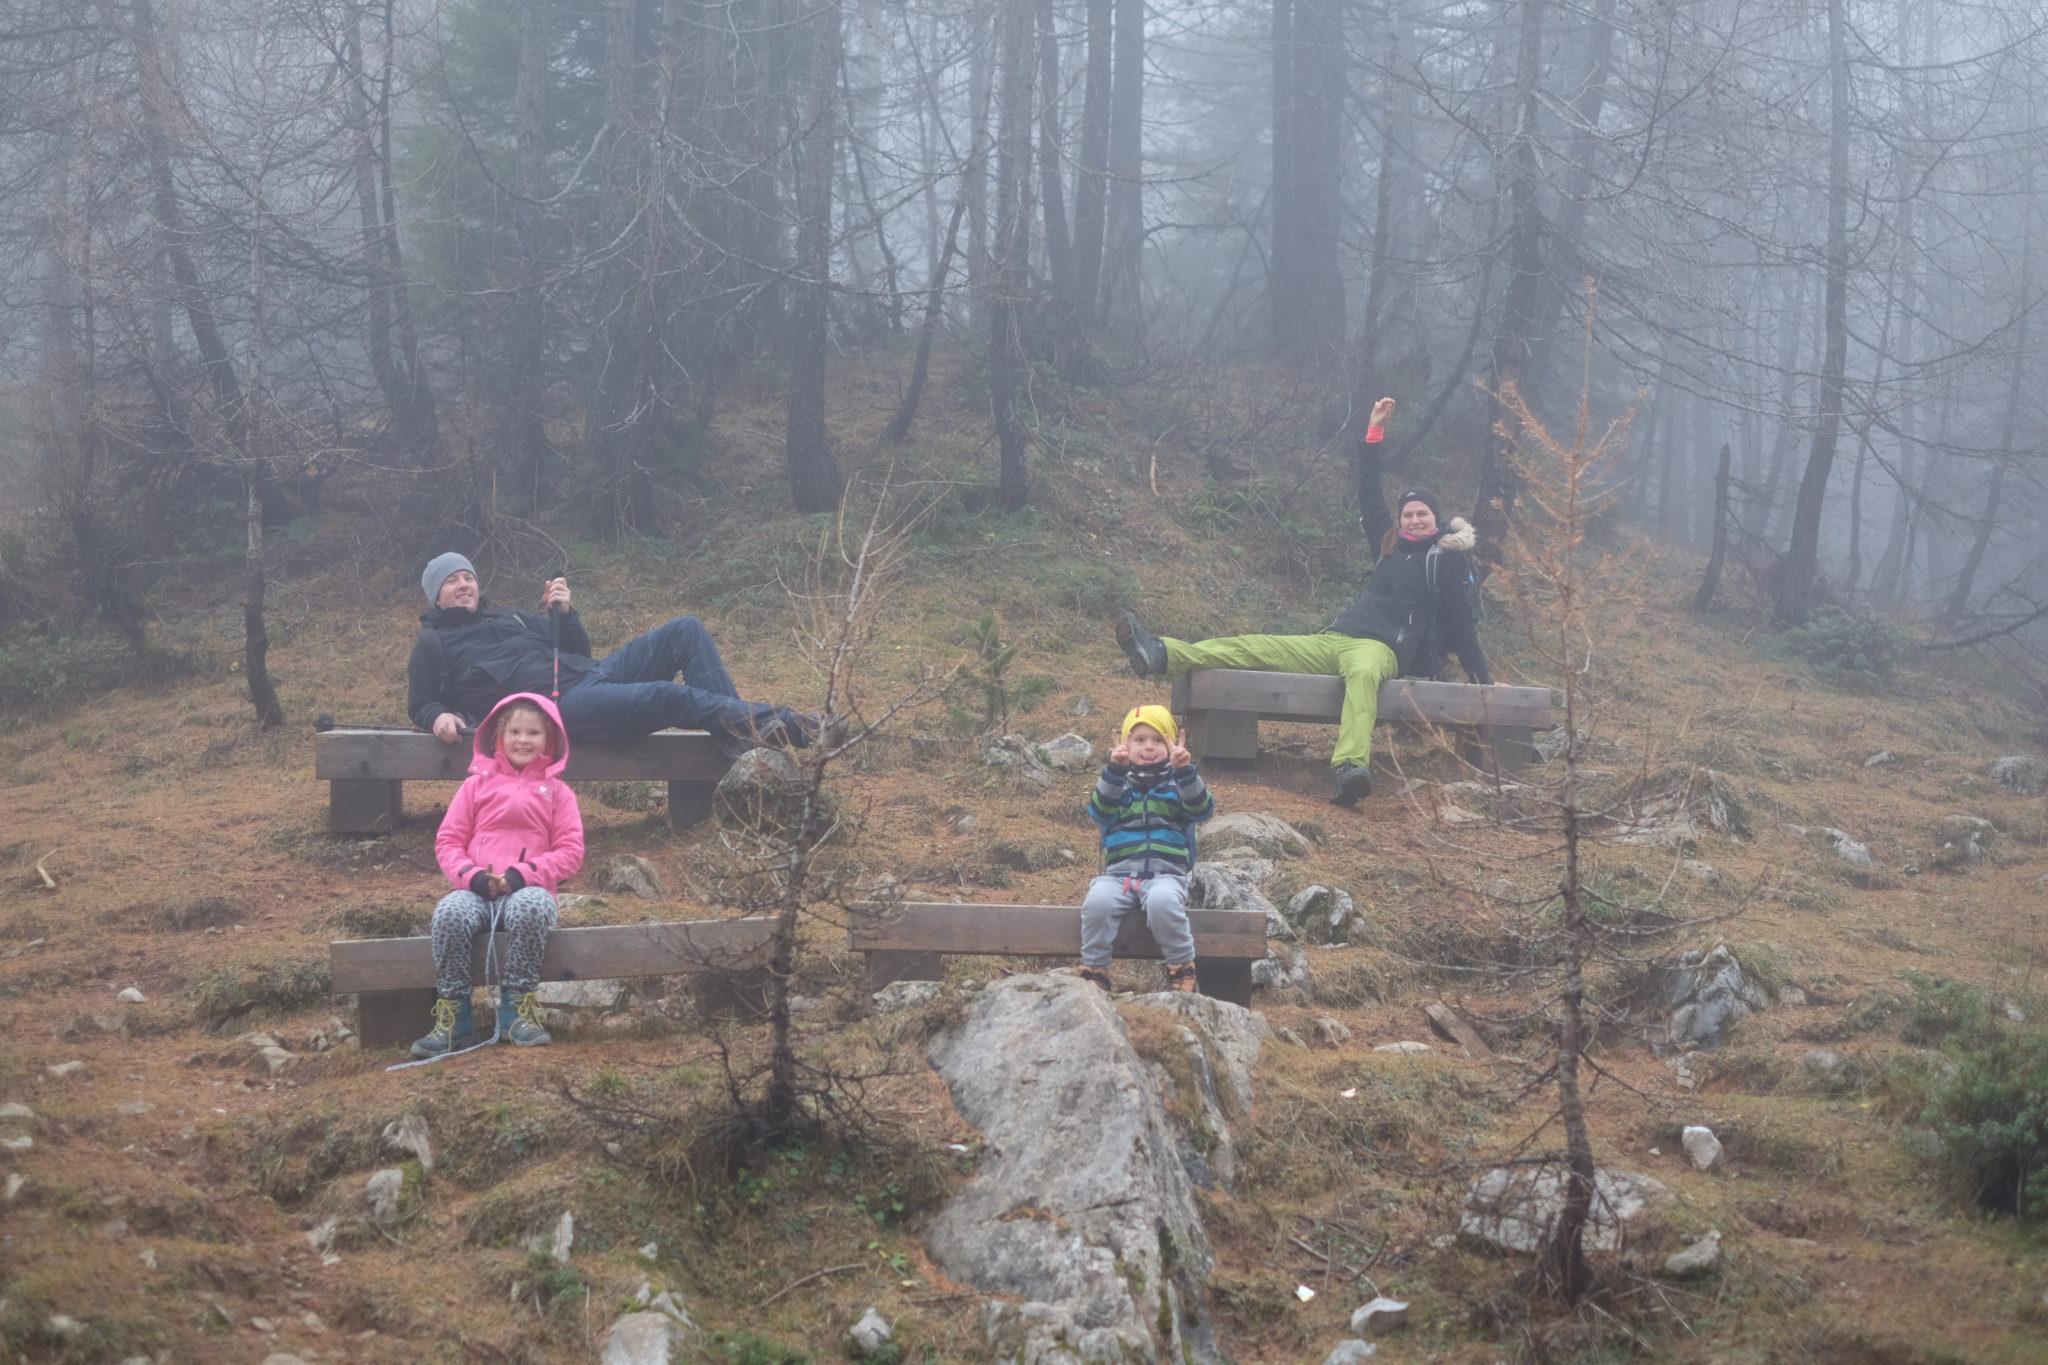 Family having fun in the mountains. Photo by: Exploring Slovenia